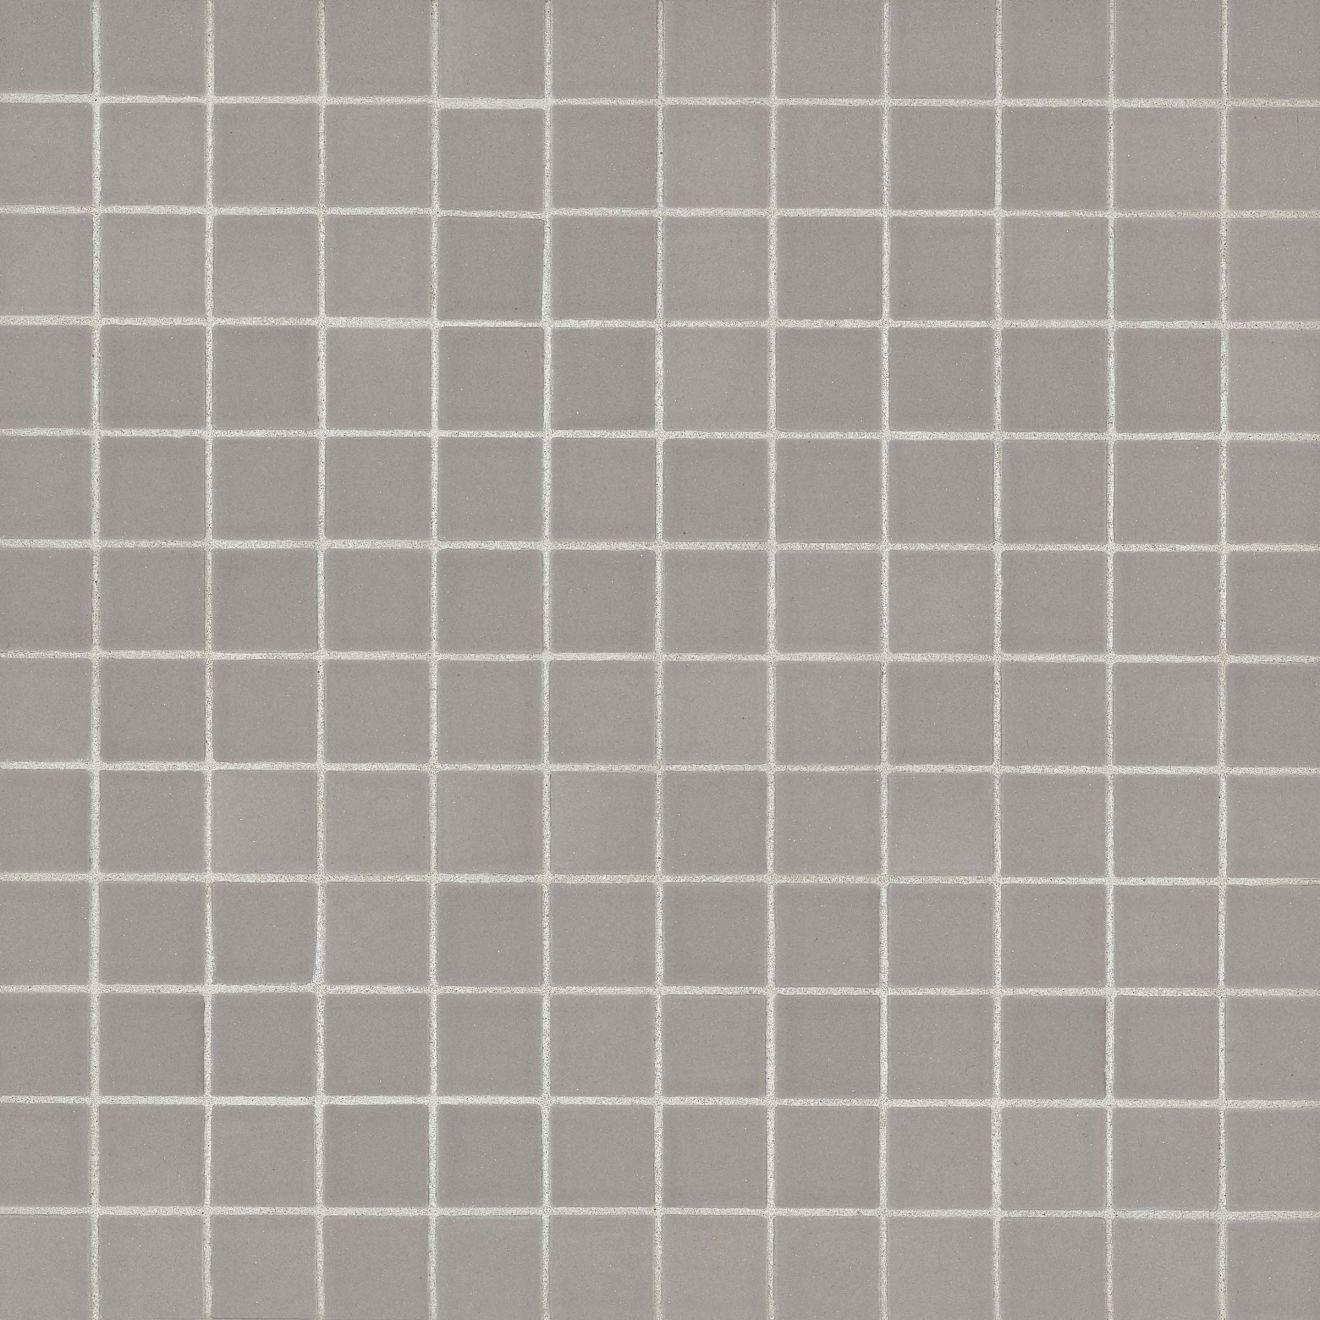 "True 1"" x 1"" Floor & Wall Mosaic in Grey"